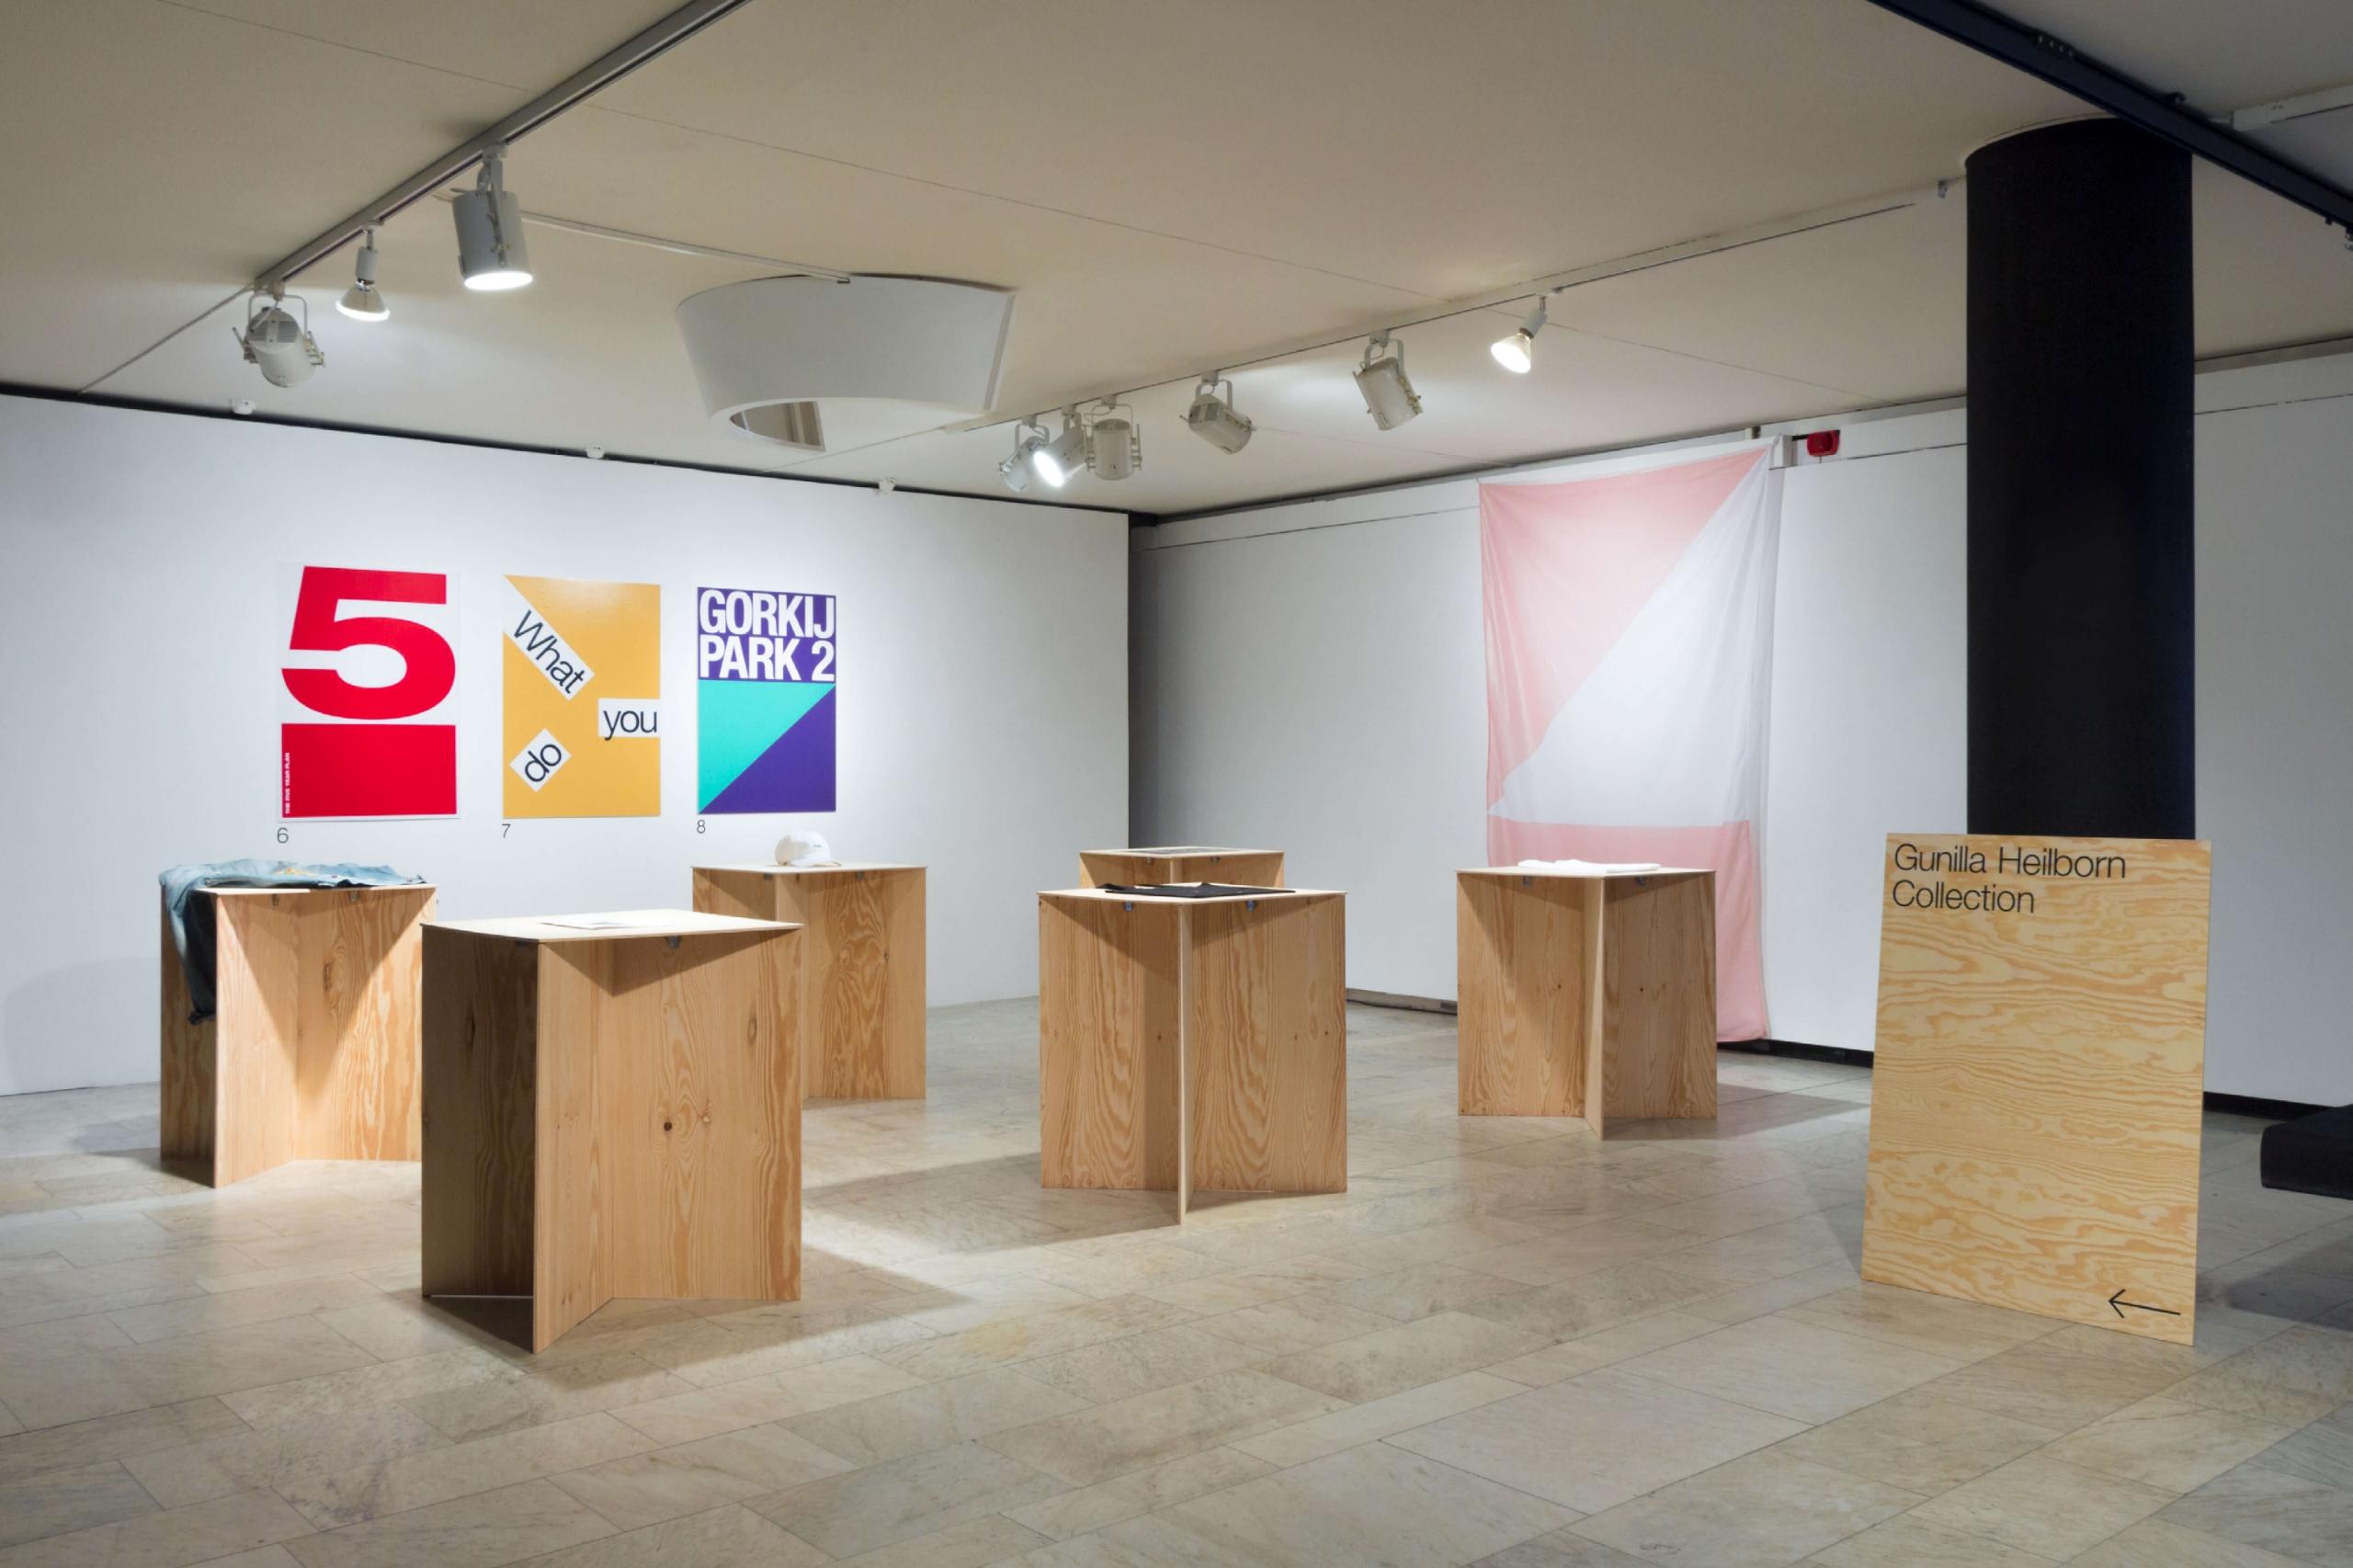 Gunilla Heilborn Collection 201 - studioreko | ello